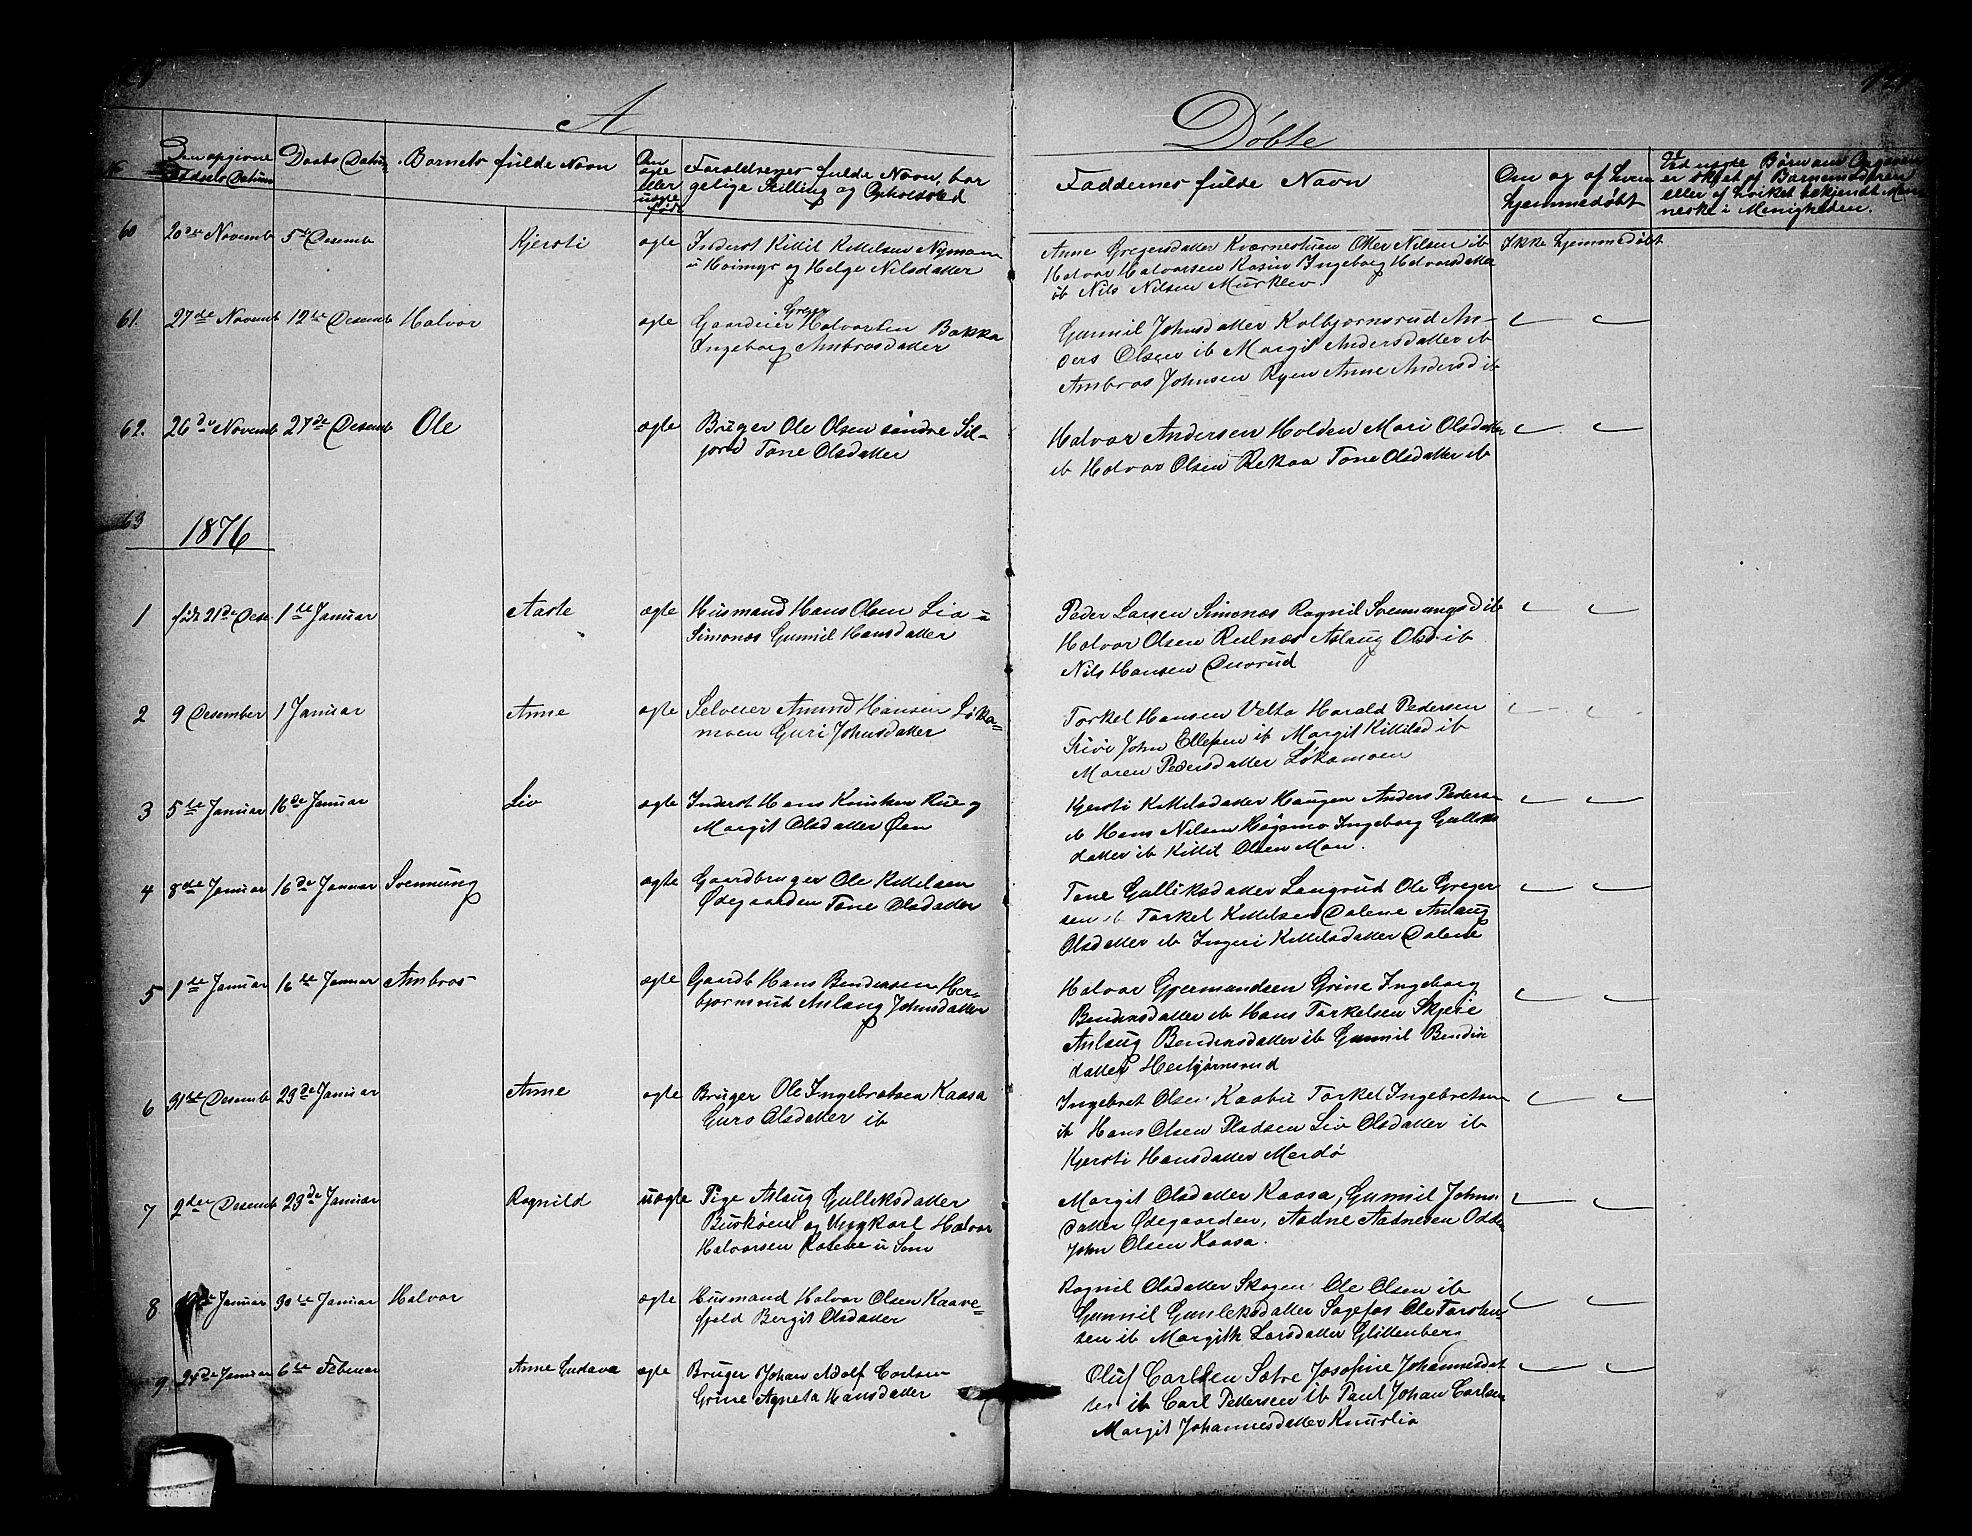 SAKO, Heddal kirkebøker, G/Ga/L0001: Klokkerbok nr. I 1, 1866-1878, s. 128-129